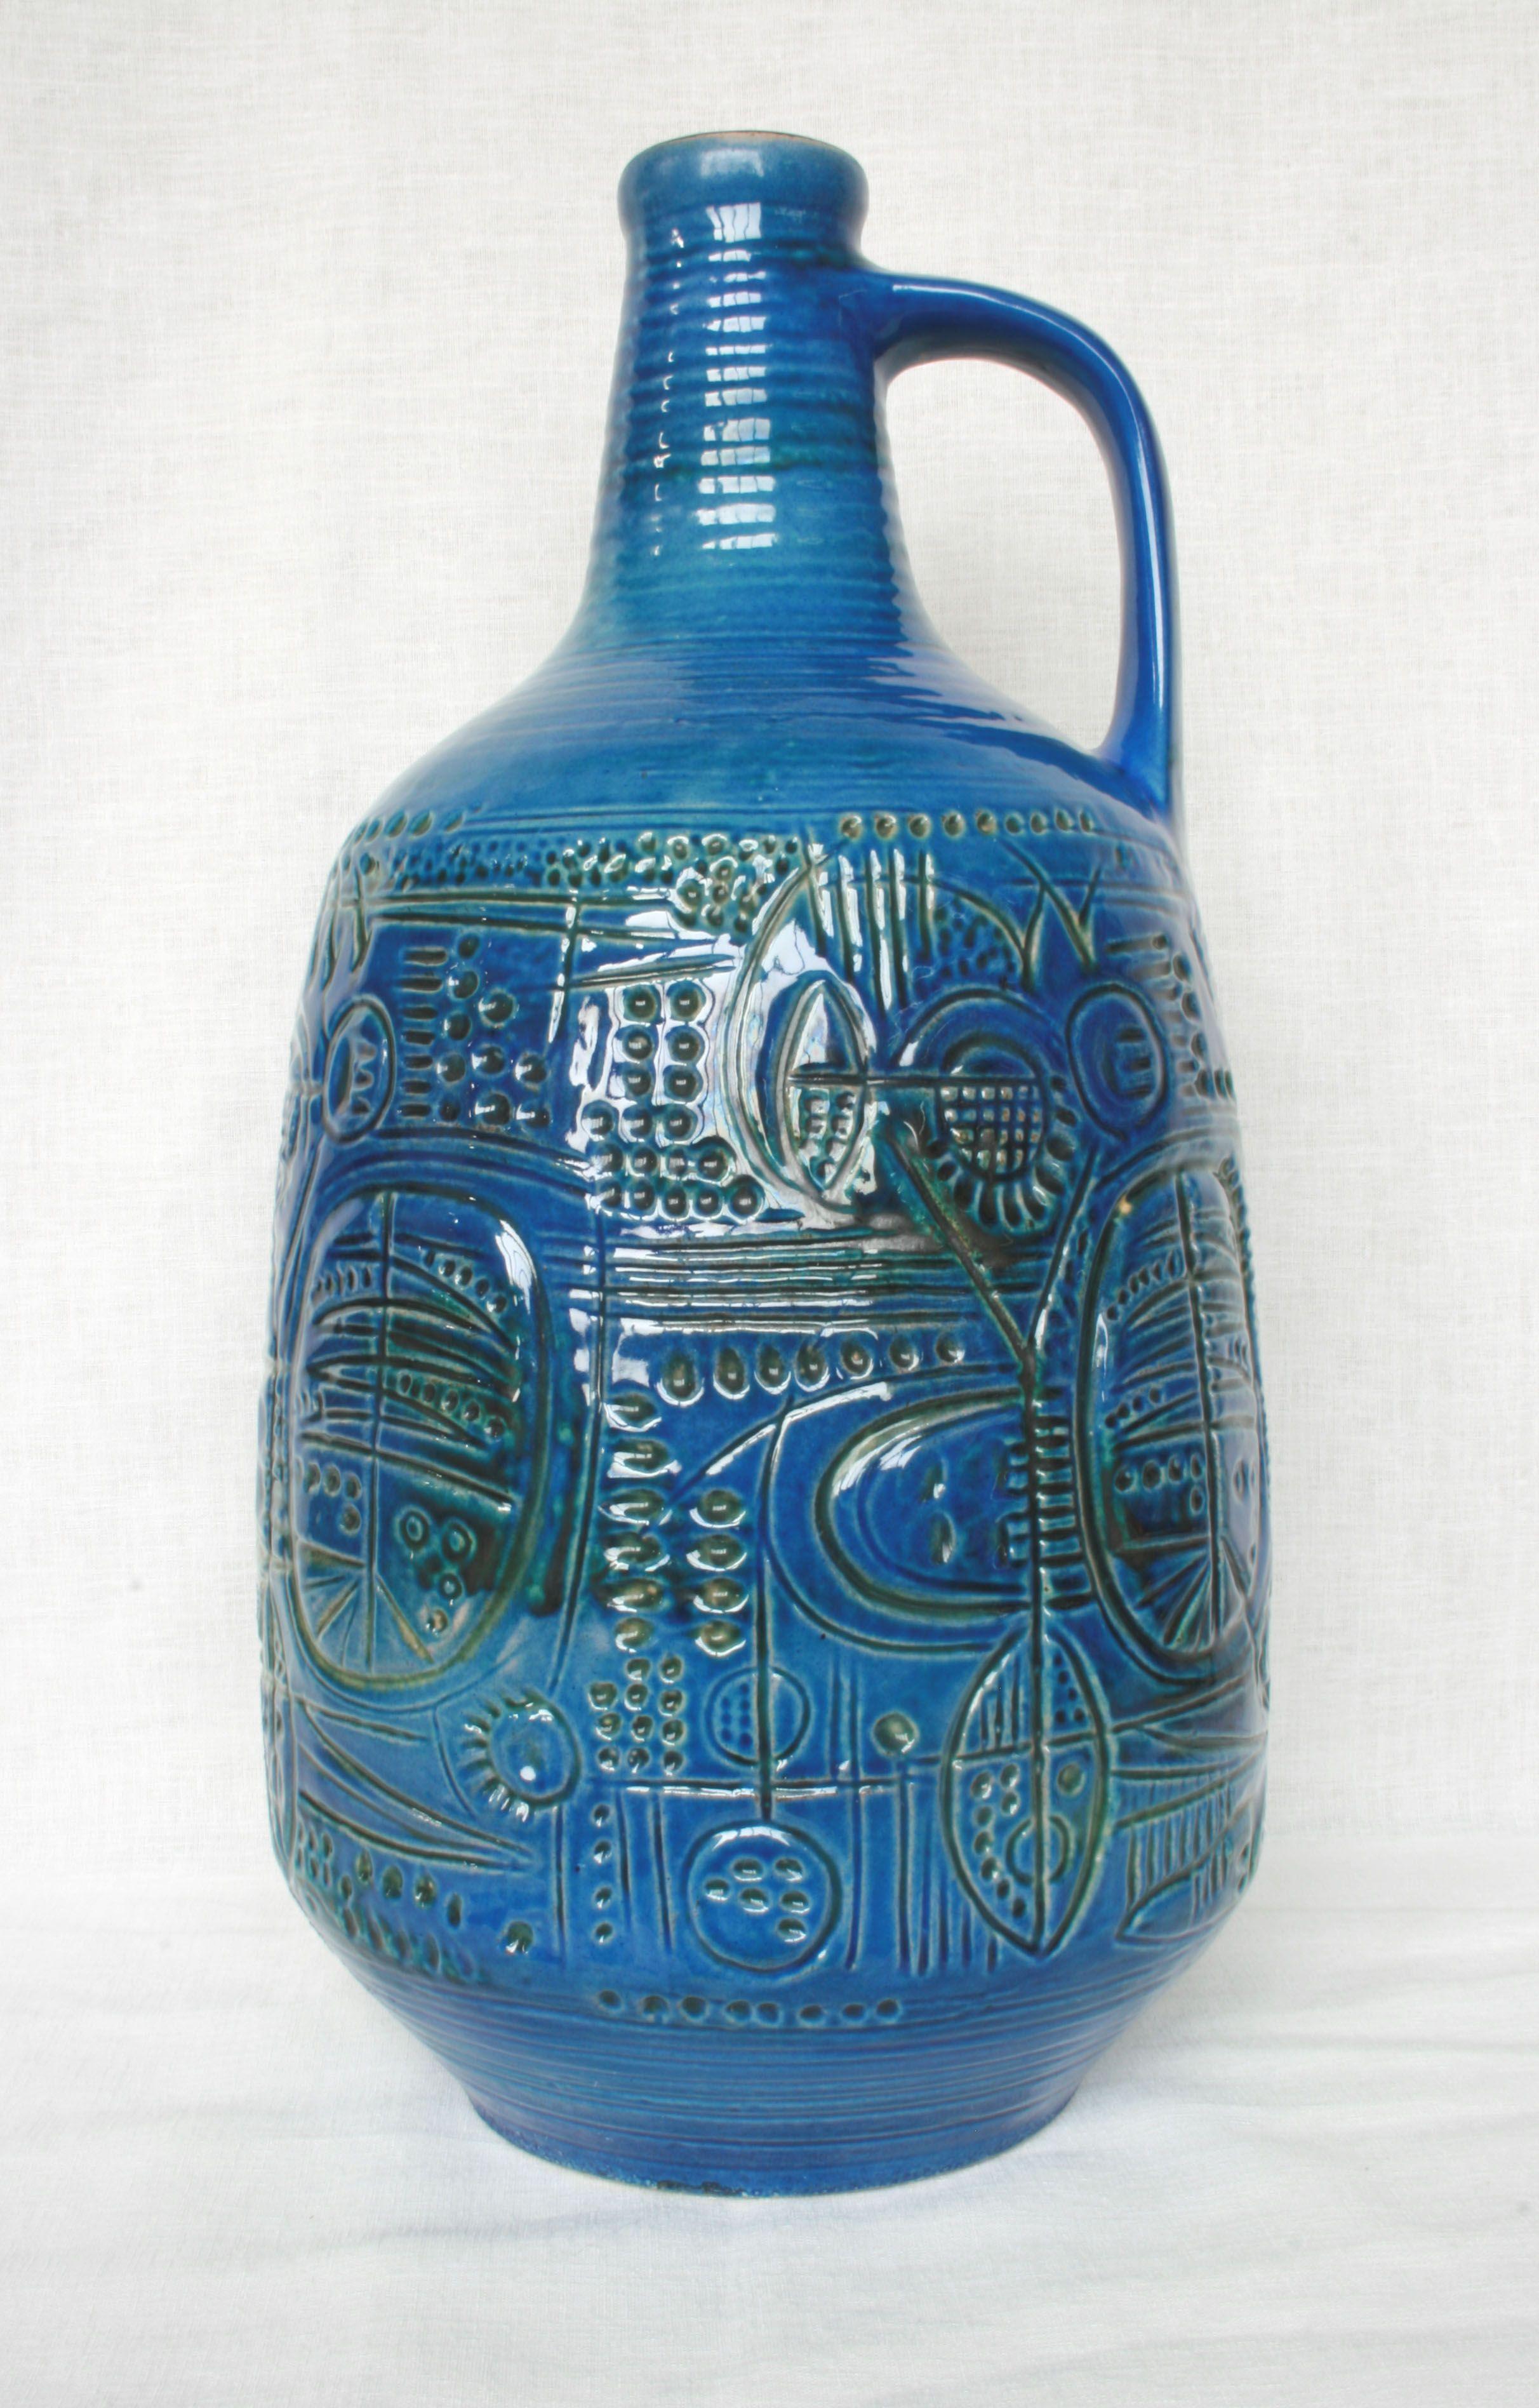 Carstens Atelier floor vase, moulded mark: 7090-50, design: Gerda Heuckeroth. WGP West German Pottery.